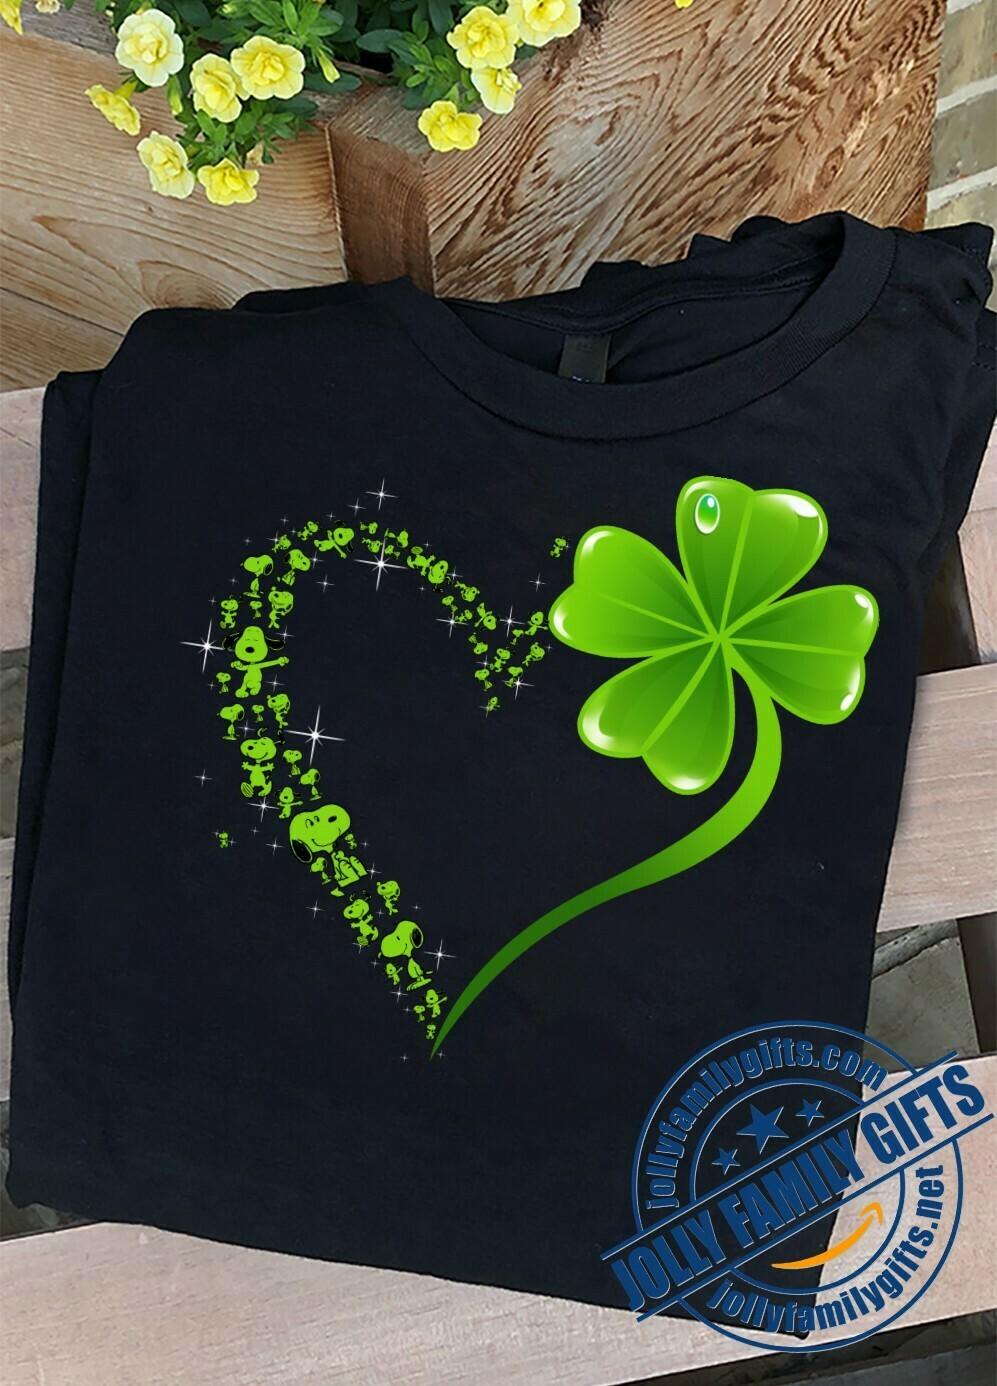 Irish Snoopy Peanuts Leprechauns Shamrock Hippie Peace Sign St Patrick Day Flowery Round  Unisex T-Shirt Hoodie Sweatshirt Sweater Plus Size for Ladies Women Men Kids Youth Gifts Tee Jolly Family